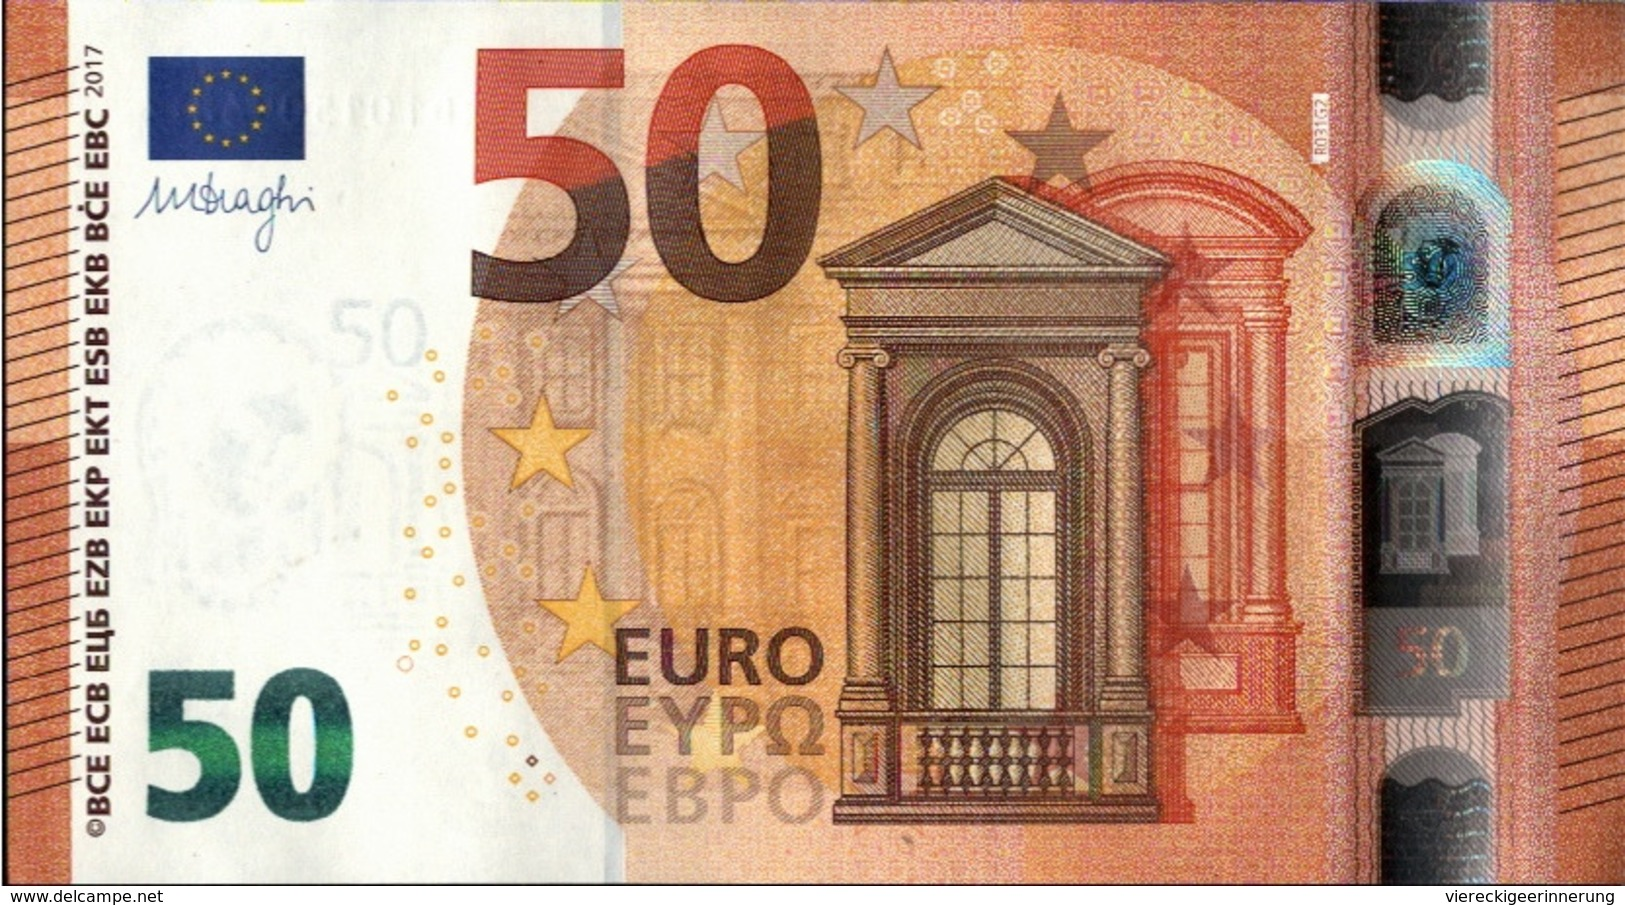 ! 50 Euro, R031G2, RD1015094874, Currency, Banknote, Billet Mario Draghi, EZB, Europäische Zentralbank - EURO